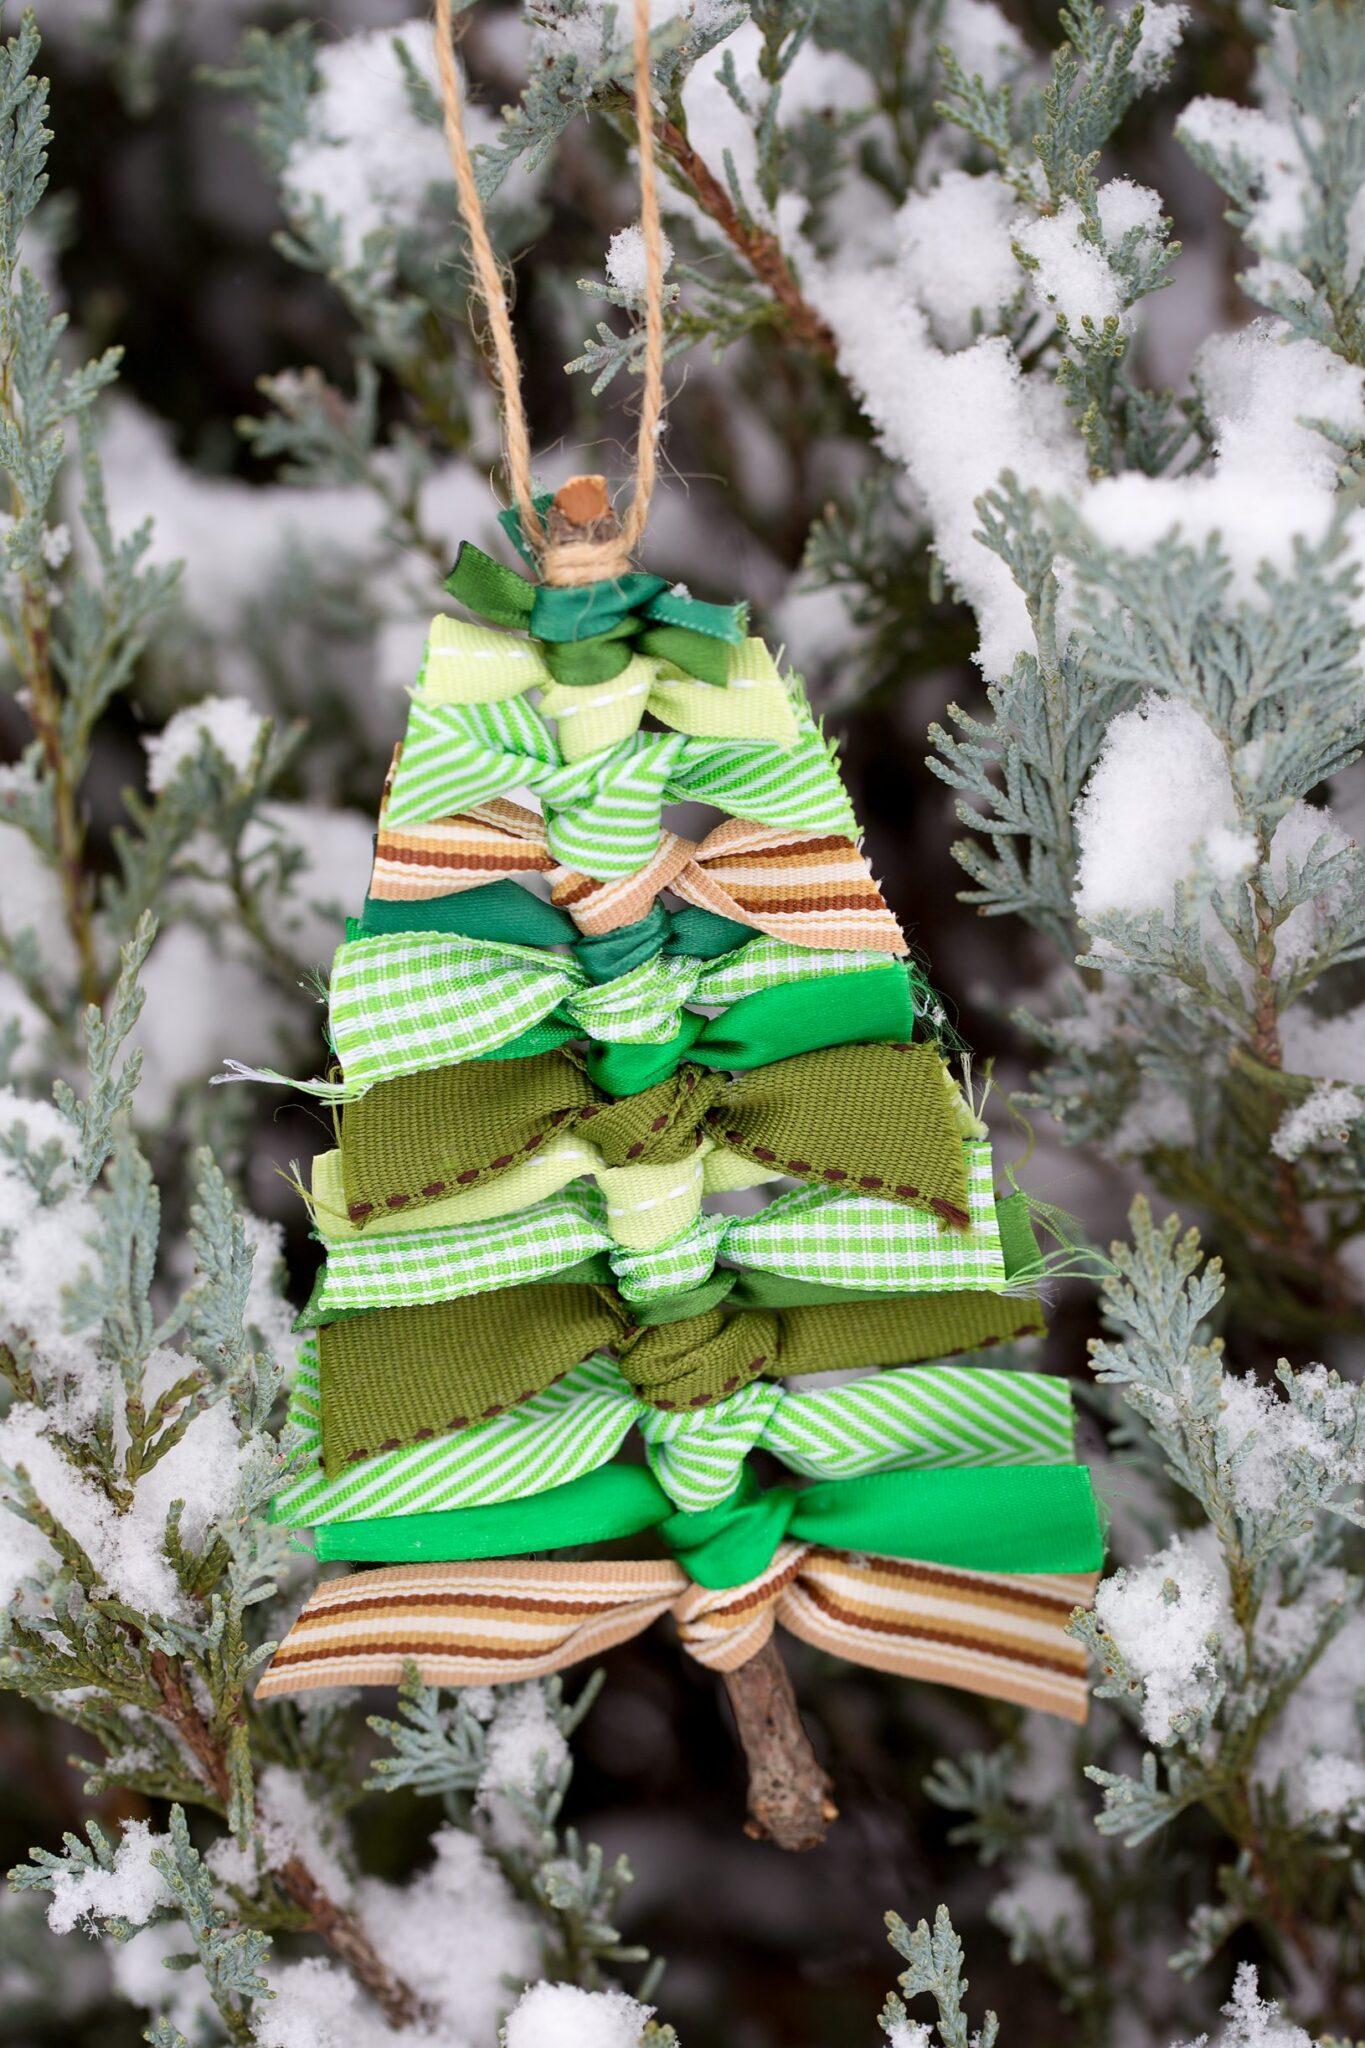 Scrap Ribbon Christmas Tree Ornament Hanging on a Tree